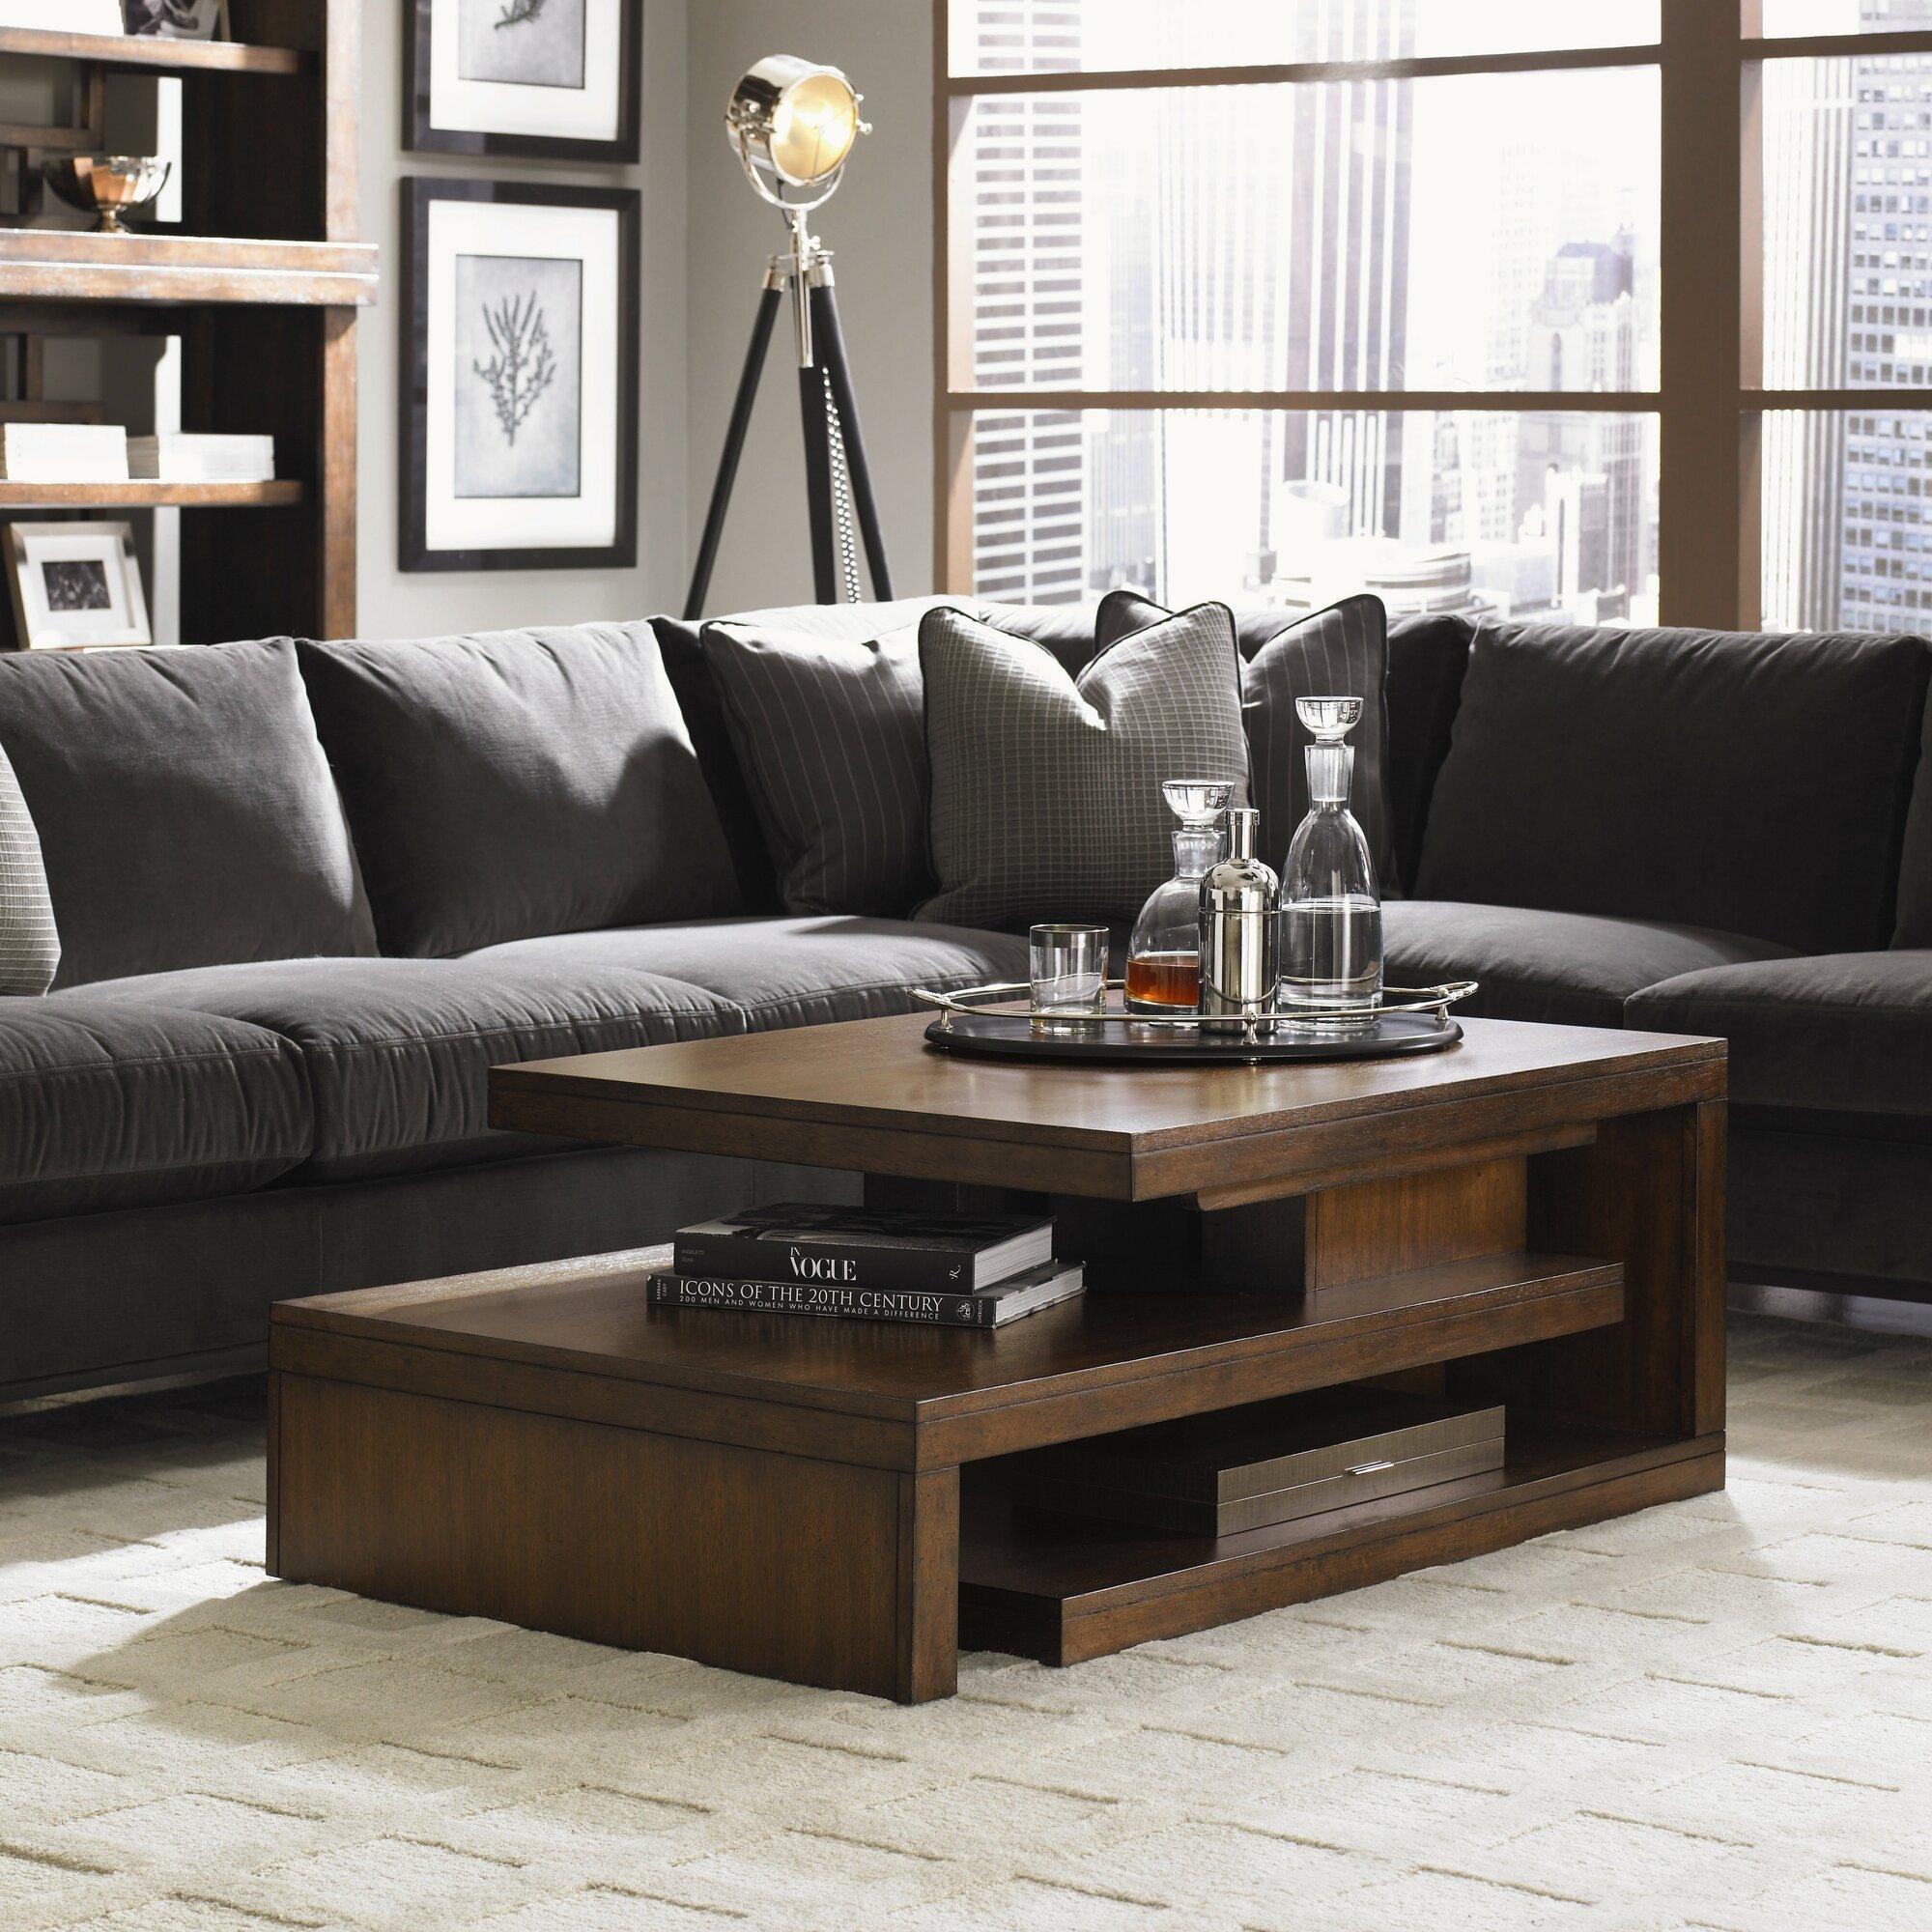 lexington 11 south cascade coffee table reviews wayfair. Black Bedroom Furniture Sets. Home Design Ideas